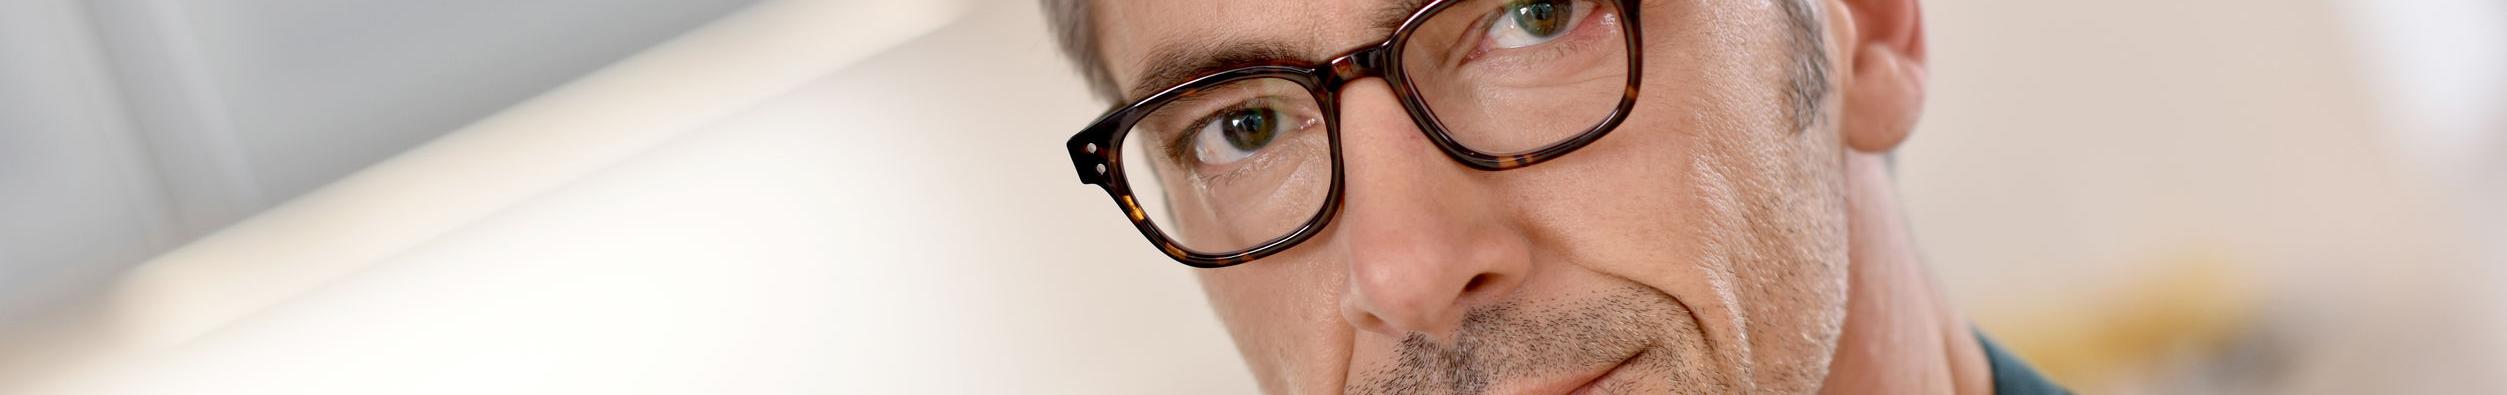 Man Wearing Glasses Boerne Dermatologist